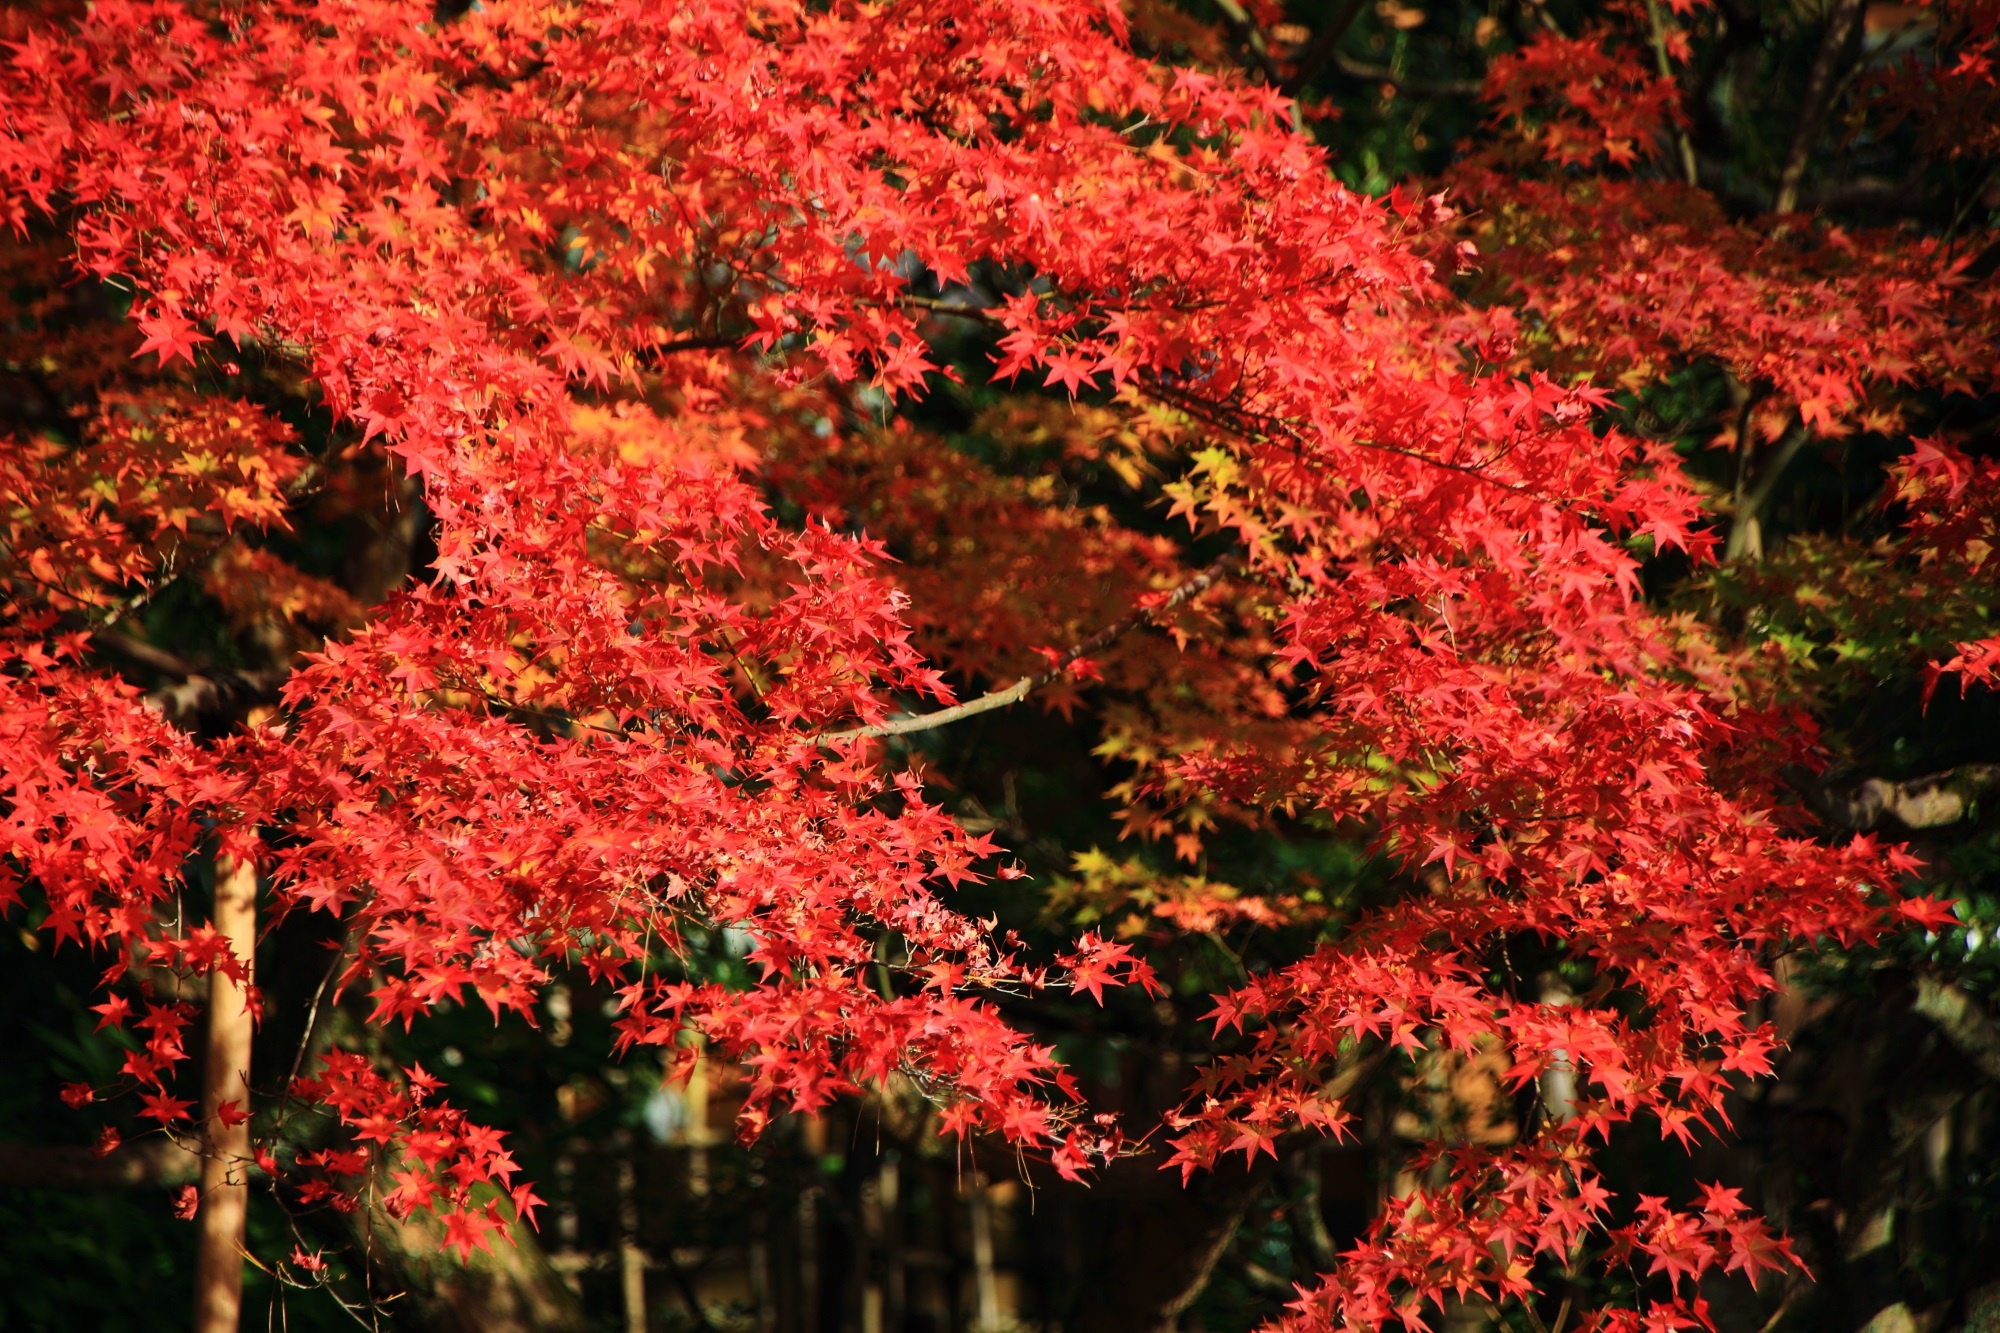 Shorenin-Temple Kyoto autumn leaves 見ごろ 鮮やか 相阿弥の庭 青蓮院